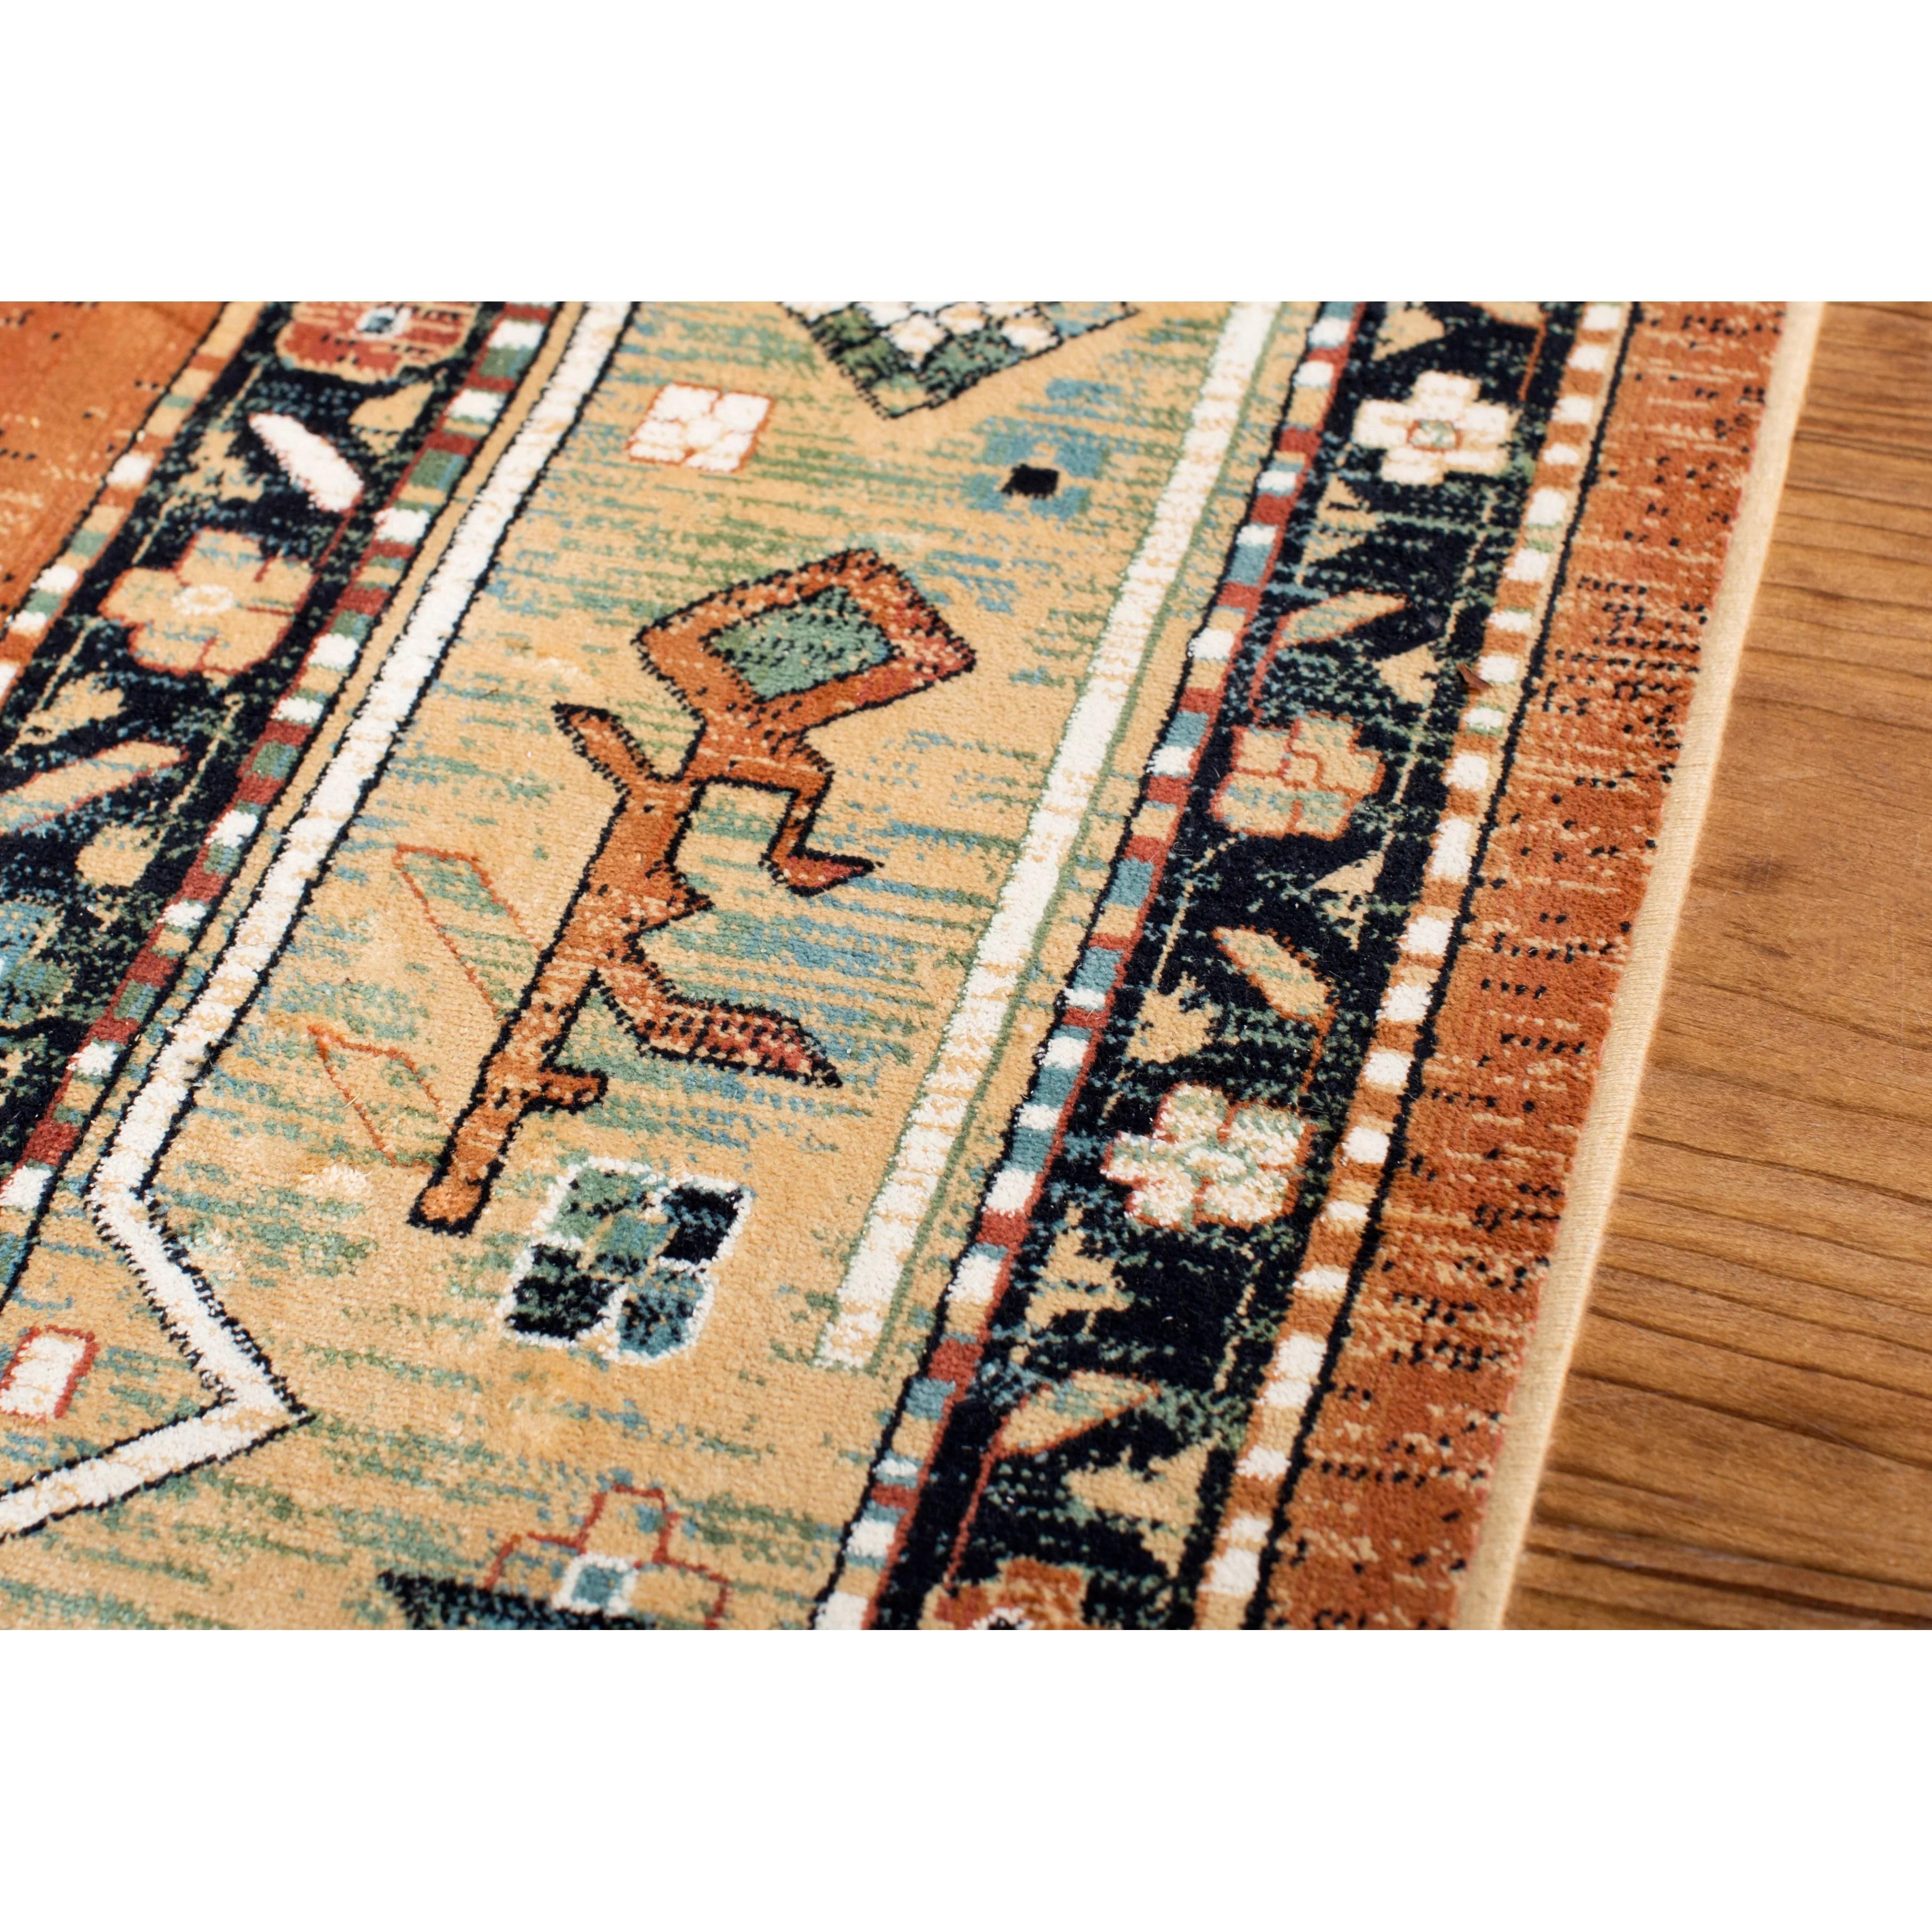 The Shining Carpet Area Rug Floor Matttroy